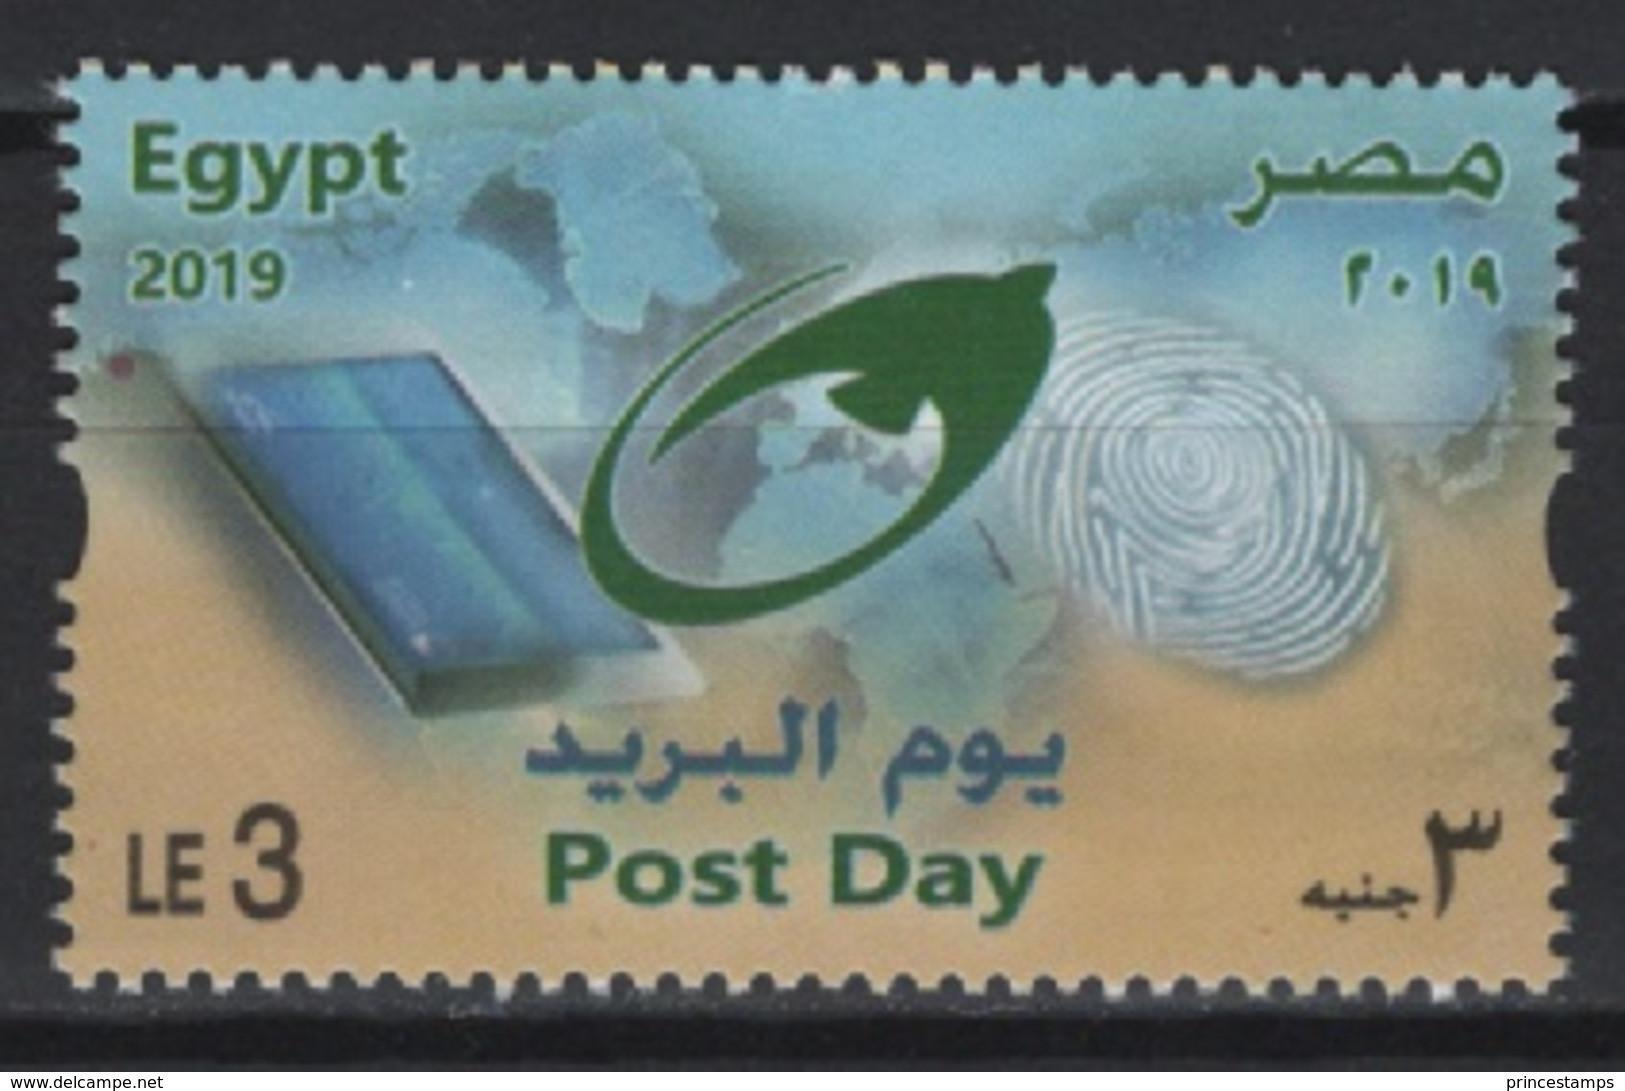 Egypt - Egypte (2019)  - Set -  /  Postal Day - Nuovi